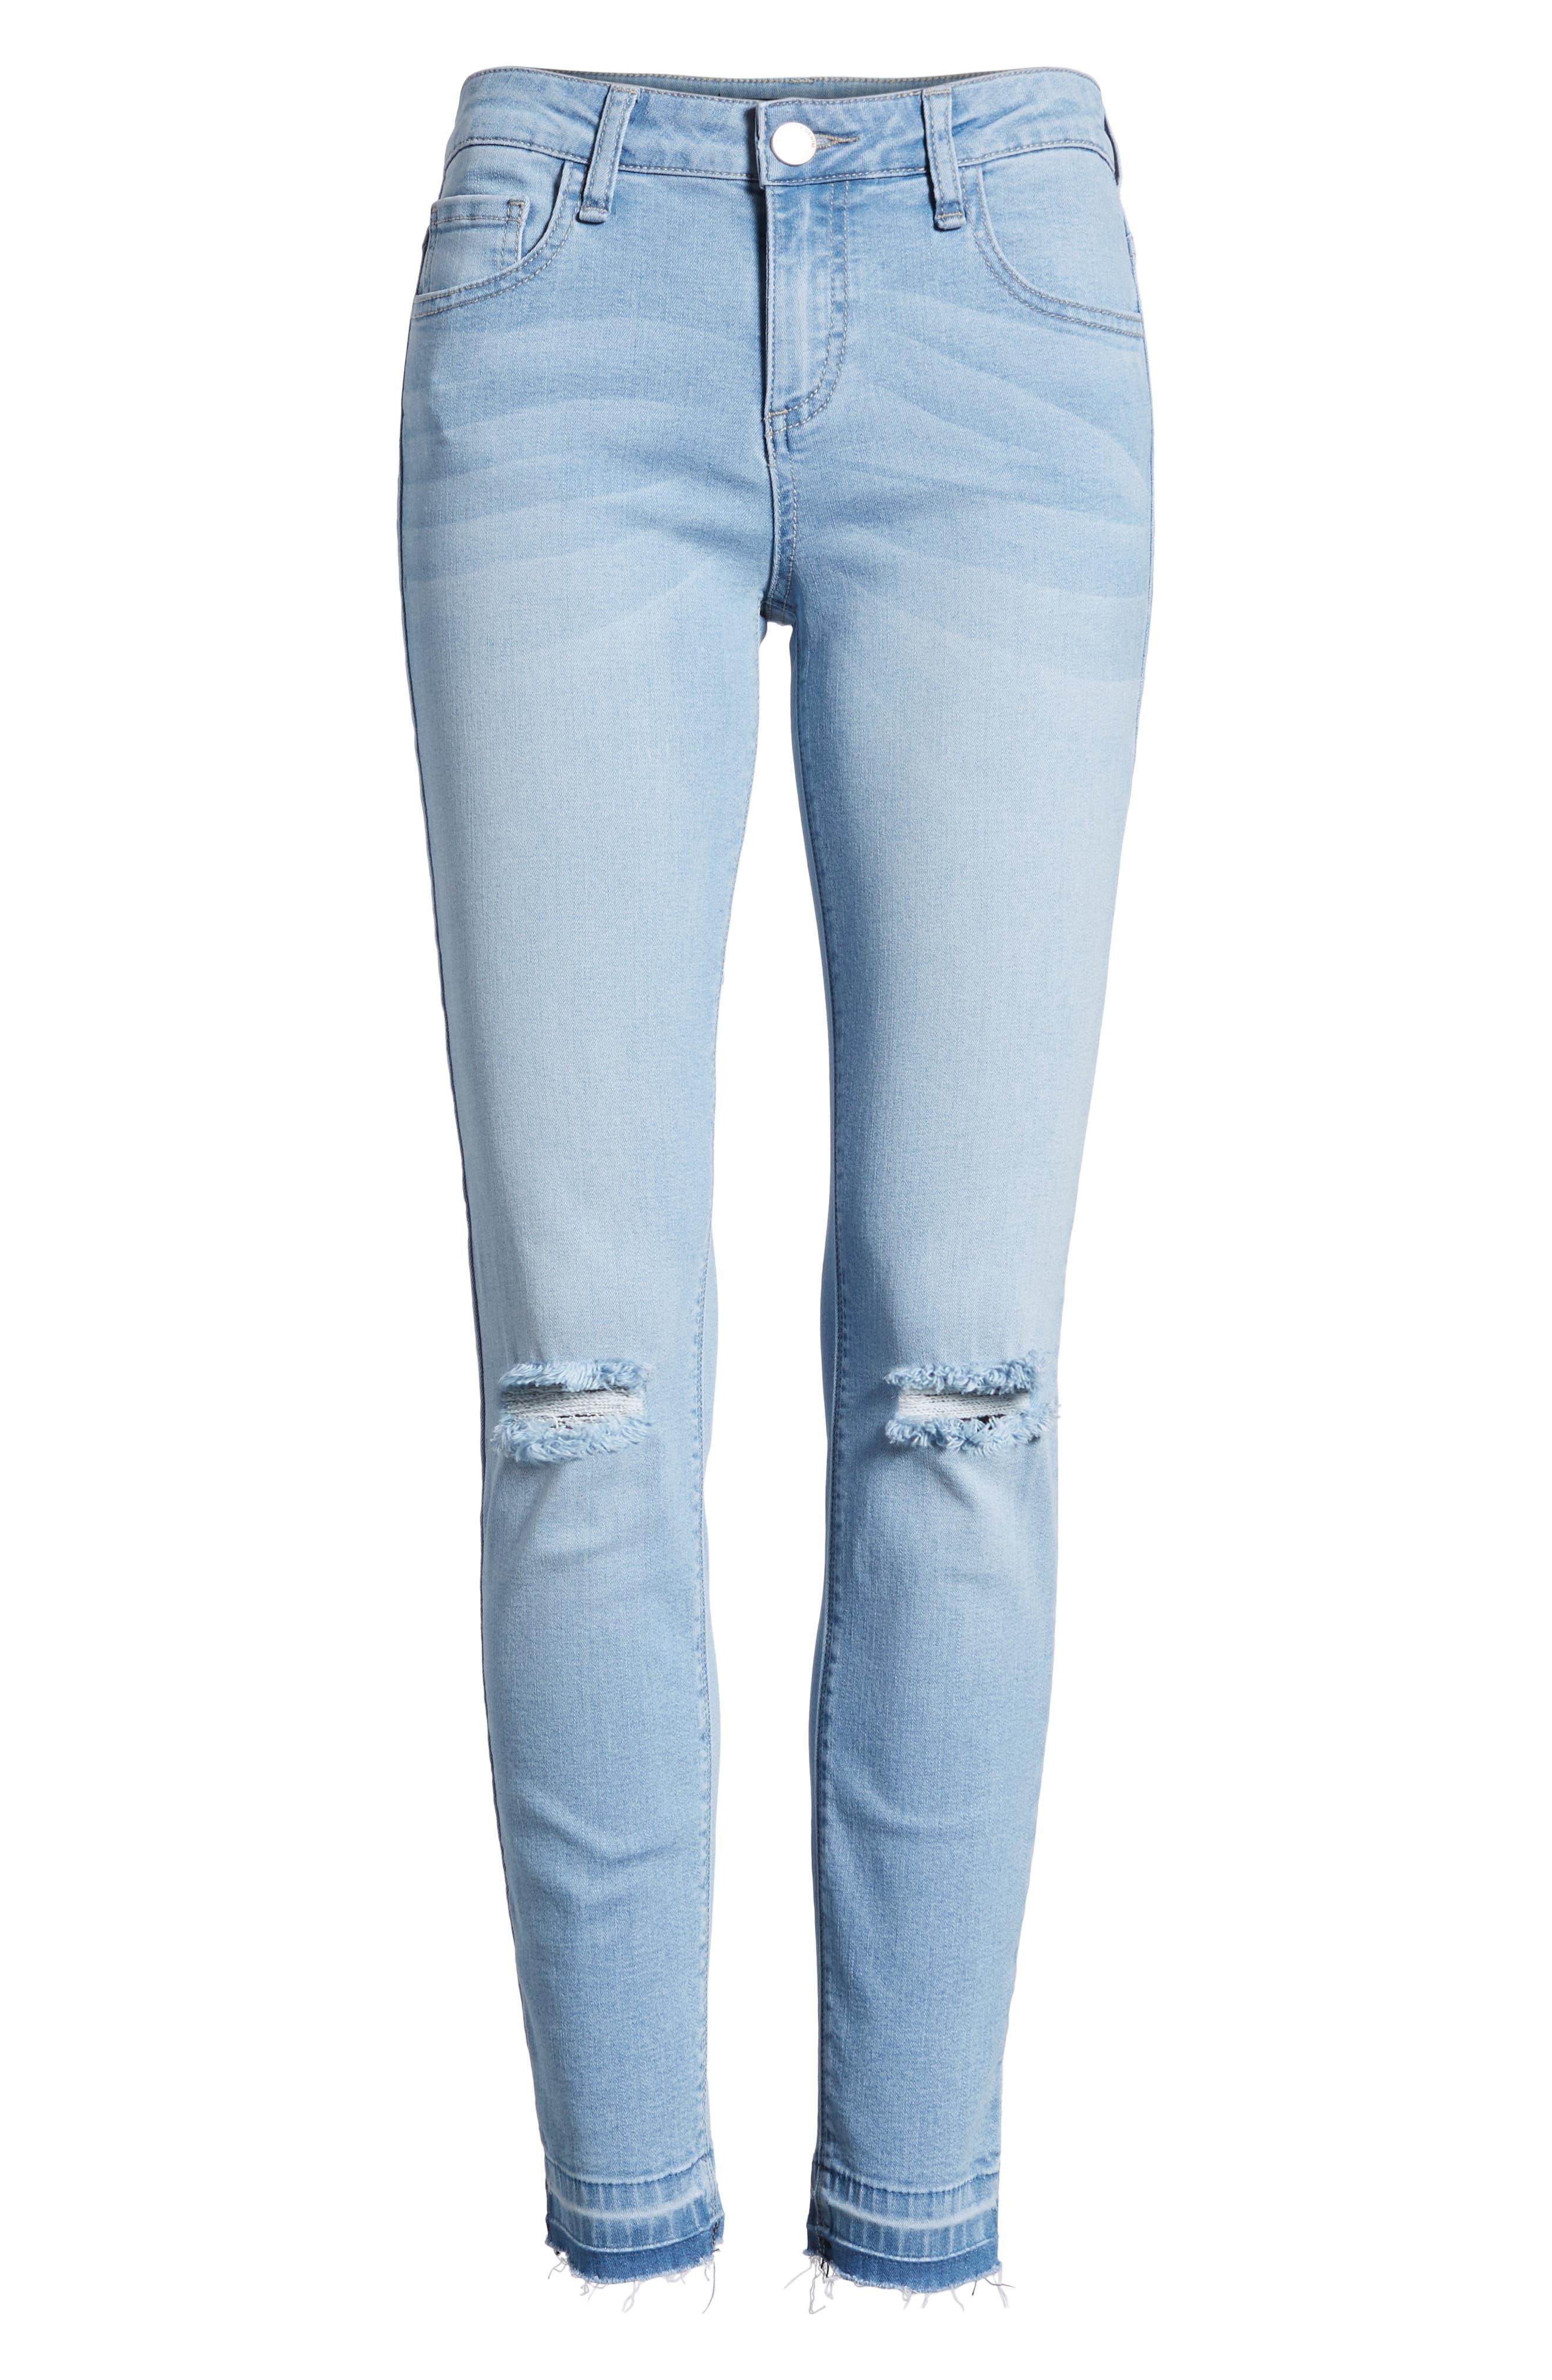 Release Hem Skinny Jeans,                             Alternate thumbnail 7, color,                             432